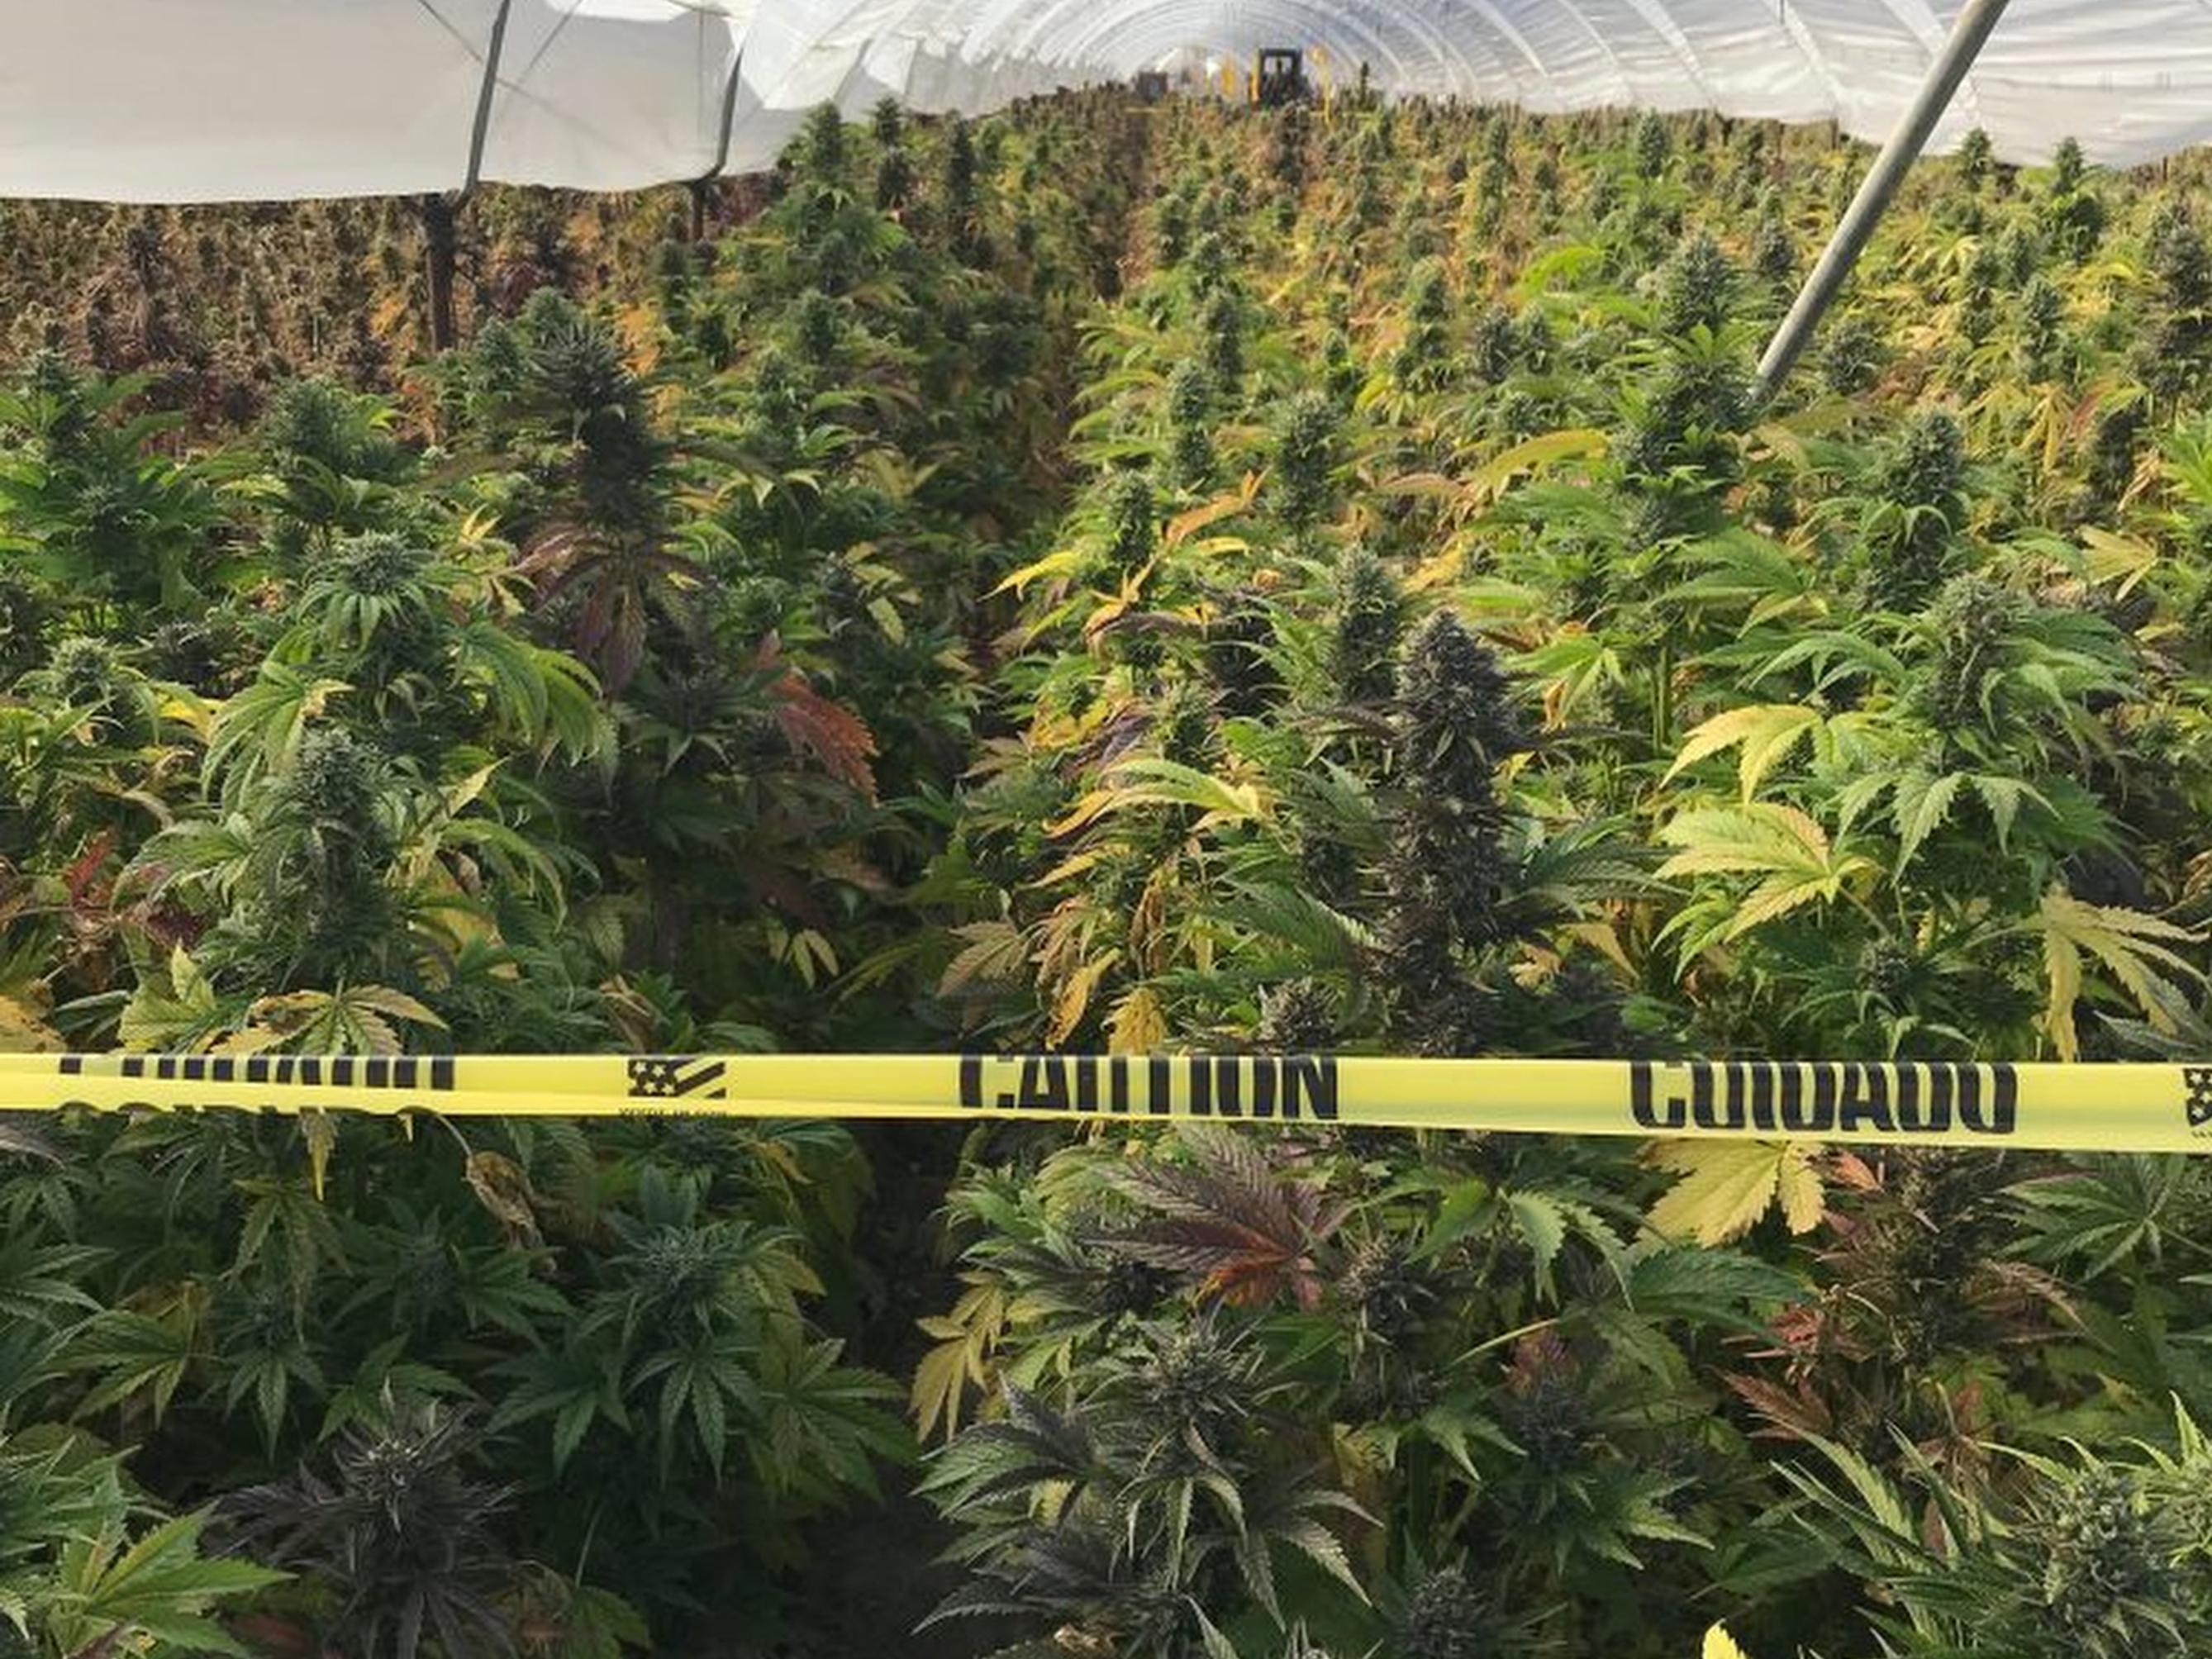 California Seizes More Than $1.5 Billion In Illegal Marijuana | WXXI News